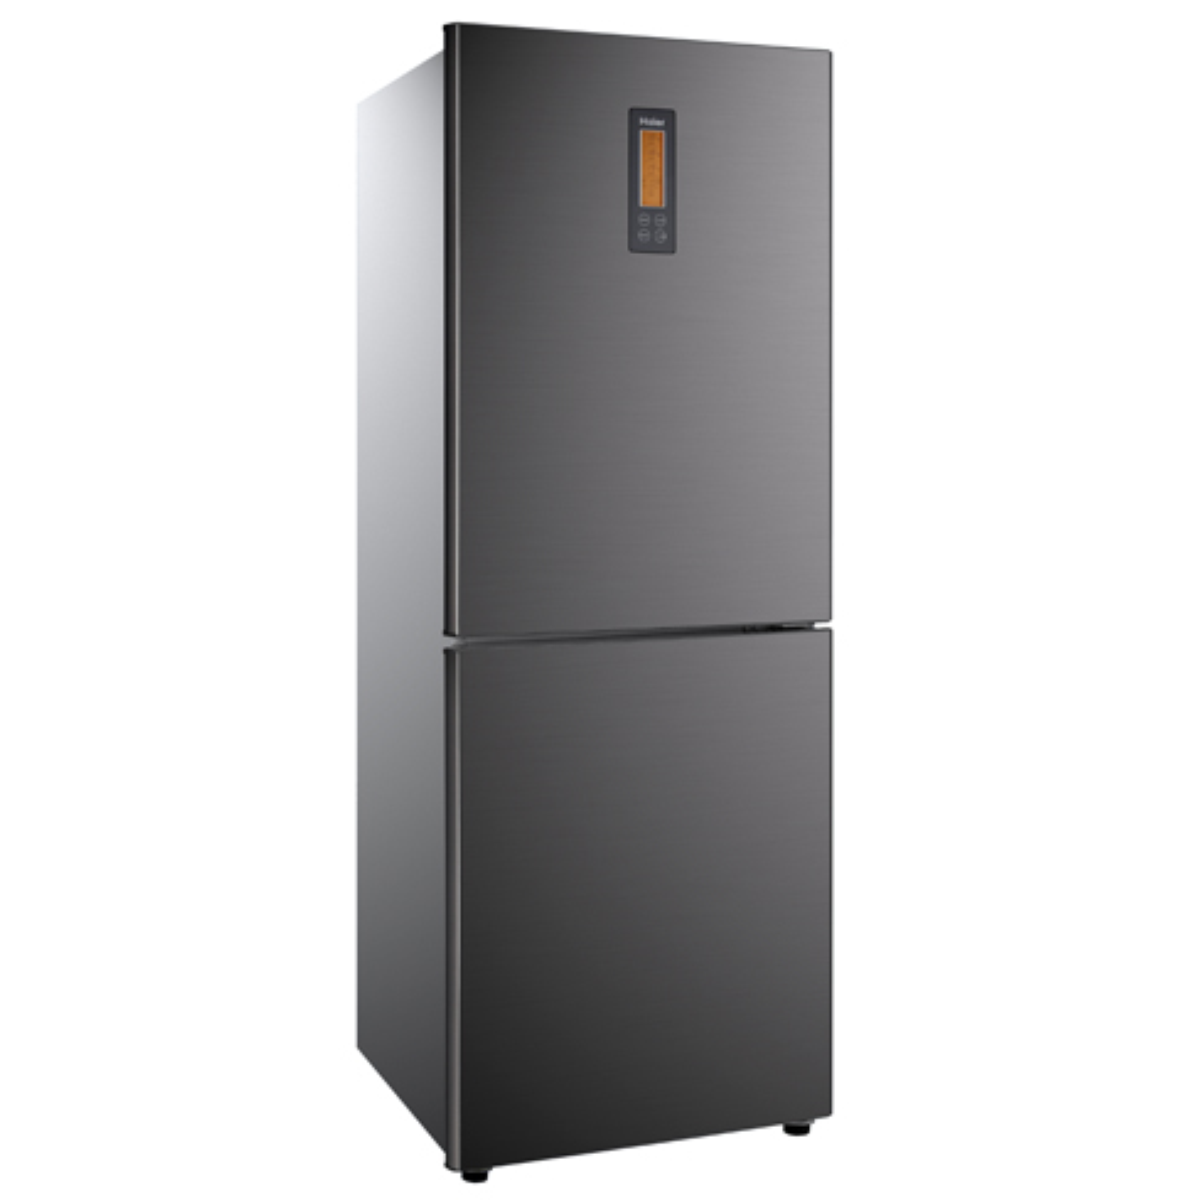 海尔冰箱 bcd-238s